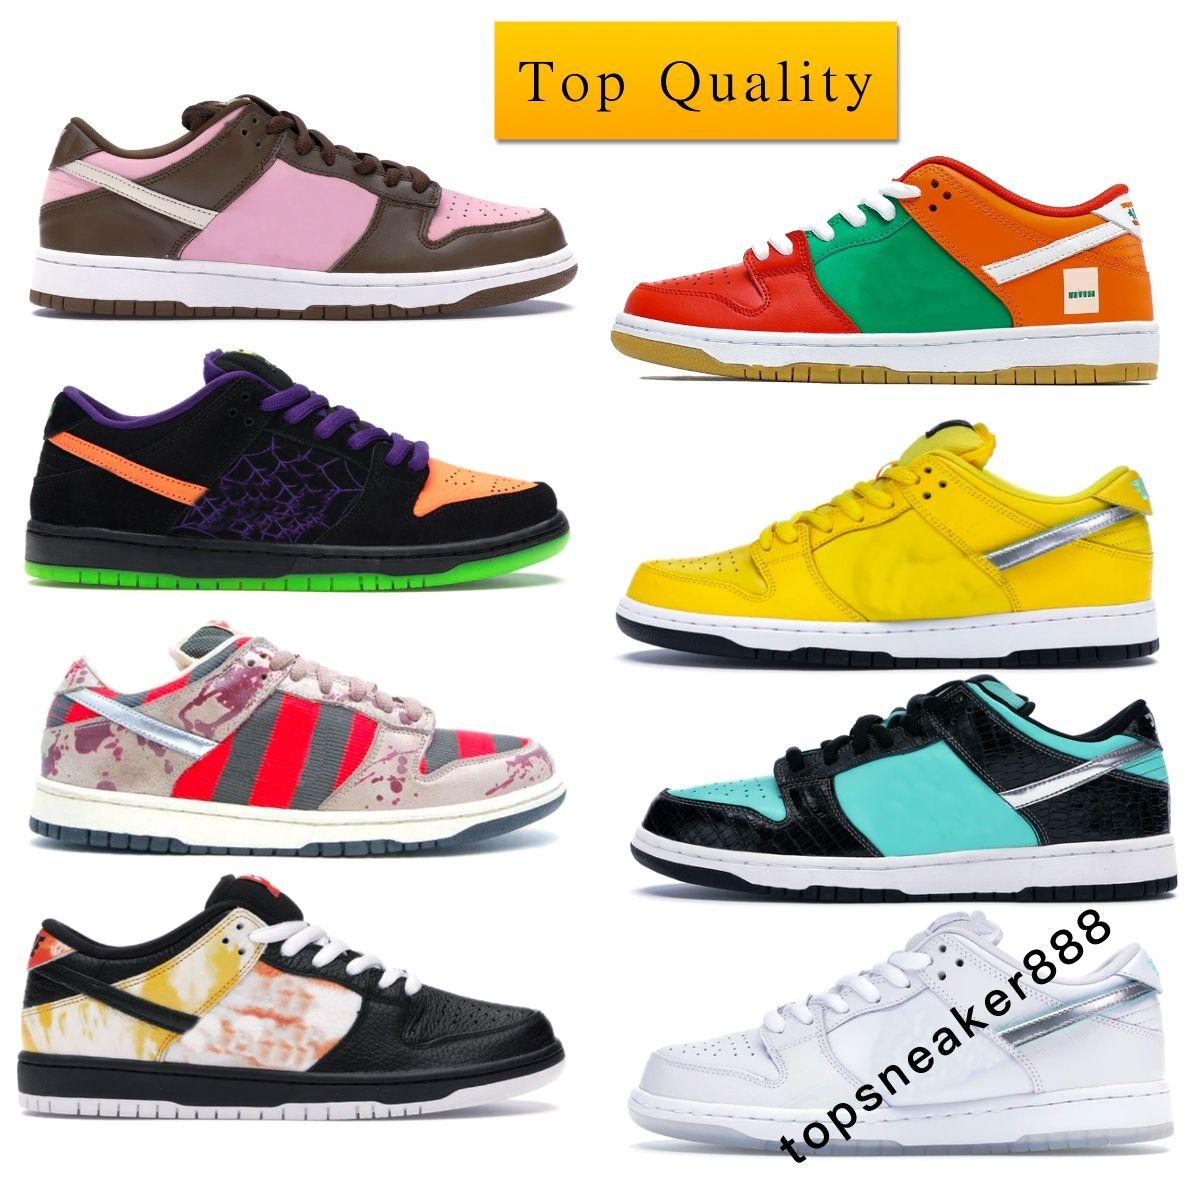 2020 SB Dunk Low Diamond Supply Co White Diamond Freddy Krueger Man Designer Shoes Women Sneaker Sport حذاء رياضة الدانتيل متابعة الأحذية مع صندوق